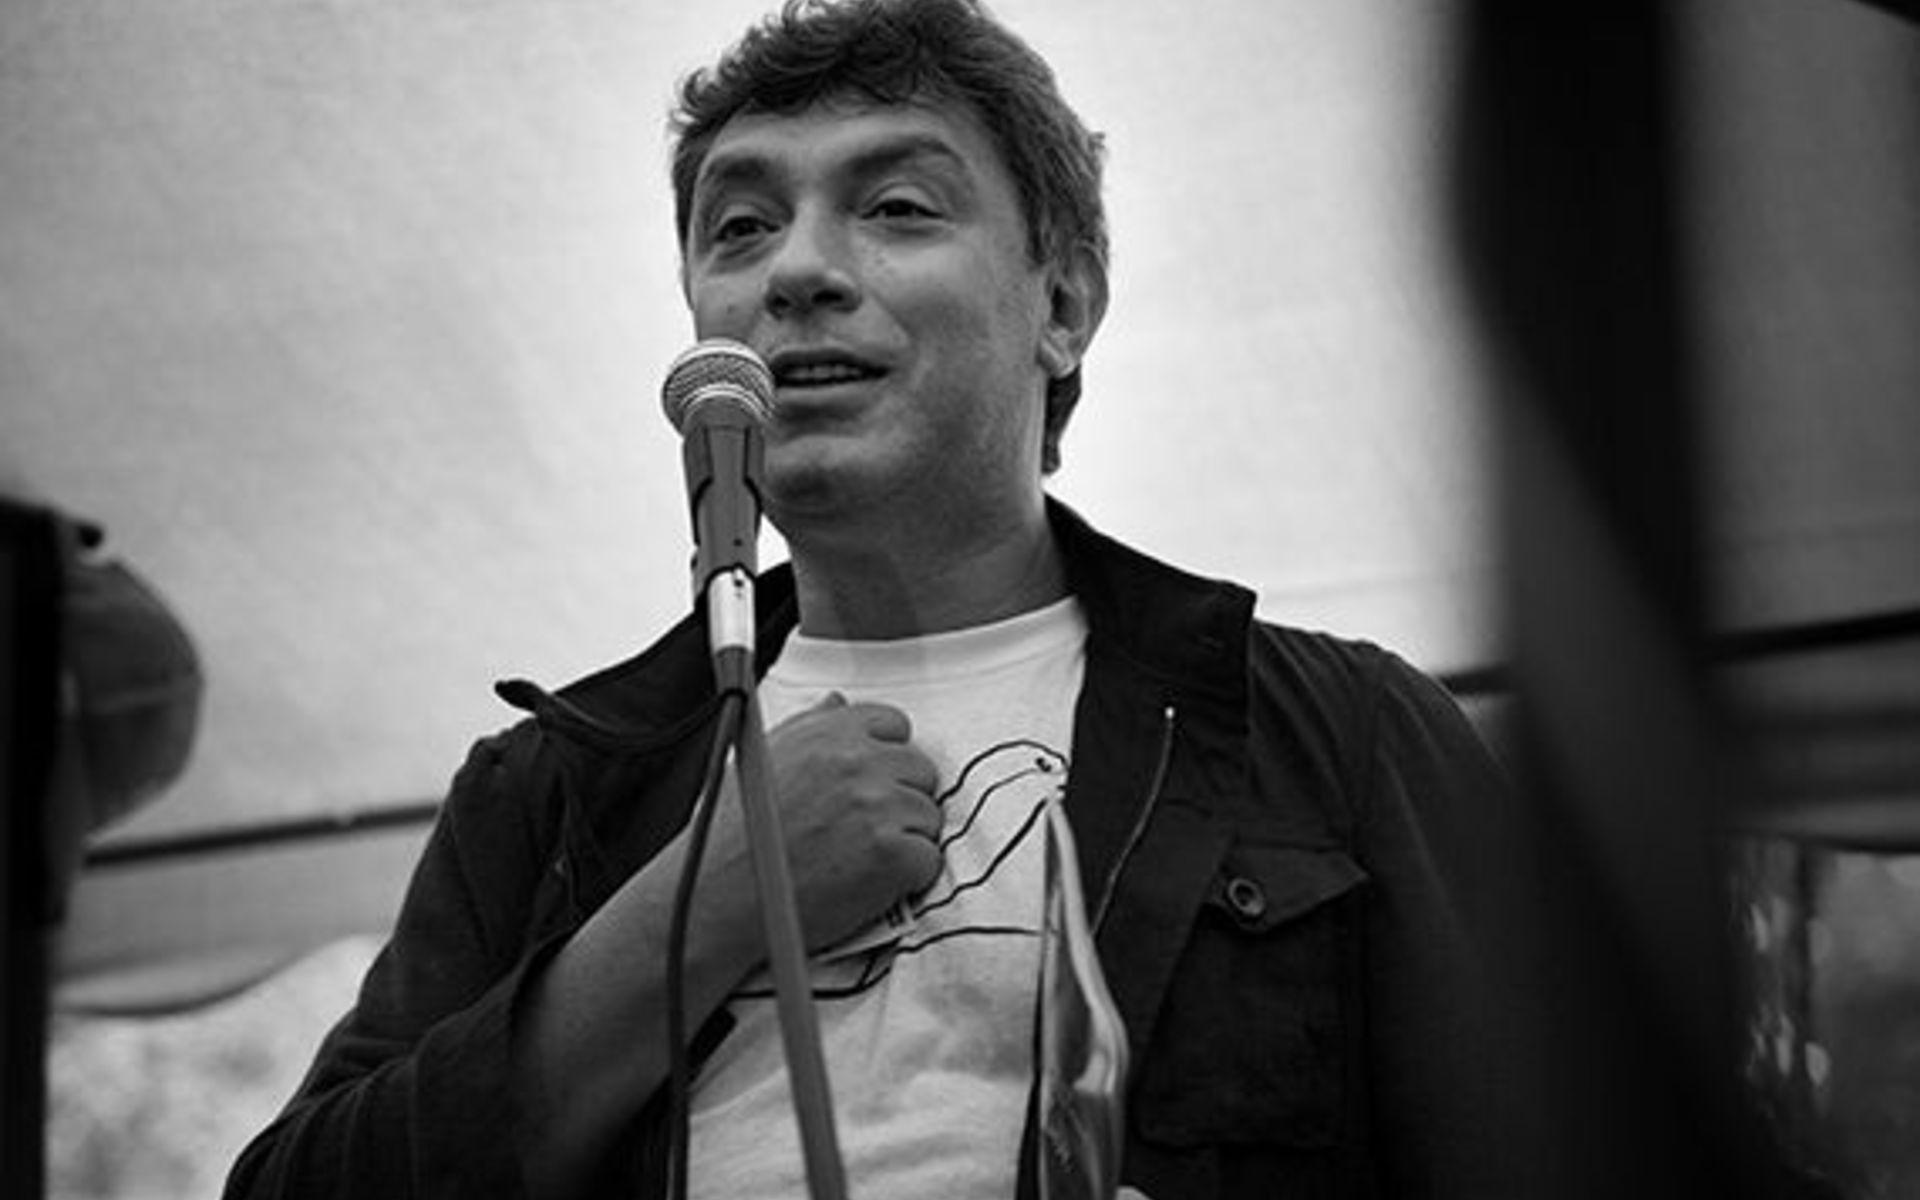 фото ЗакС политика В столичную мэрию подана заявка на проведение марша памяти Немцова